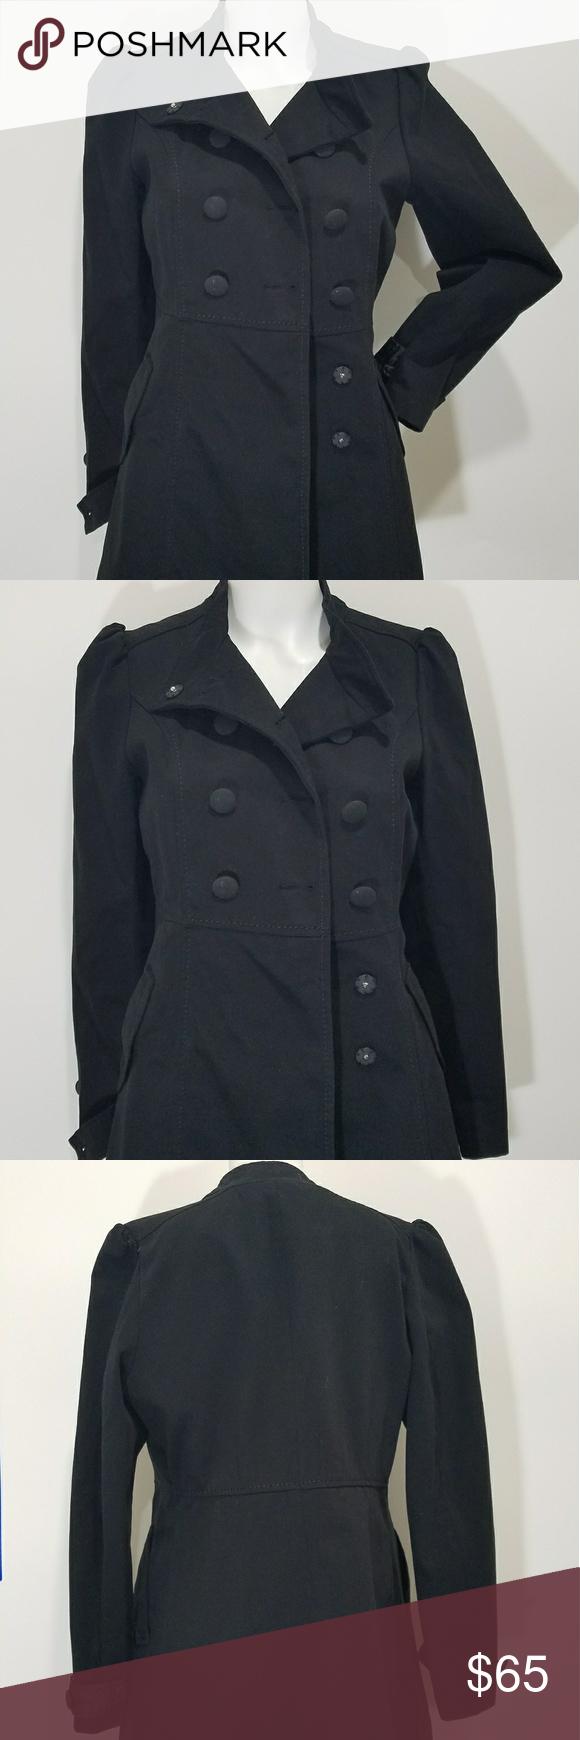 Divided By H M Women Black Dress Jacket Black Dress Jacket Womens Black Dress Clothes Design [ 1740 x 580 Pixel ]